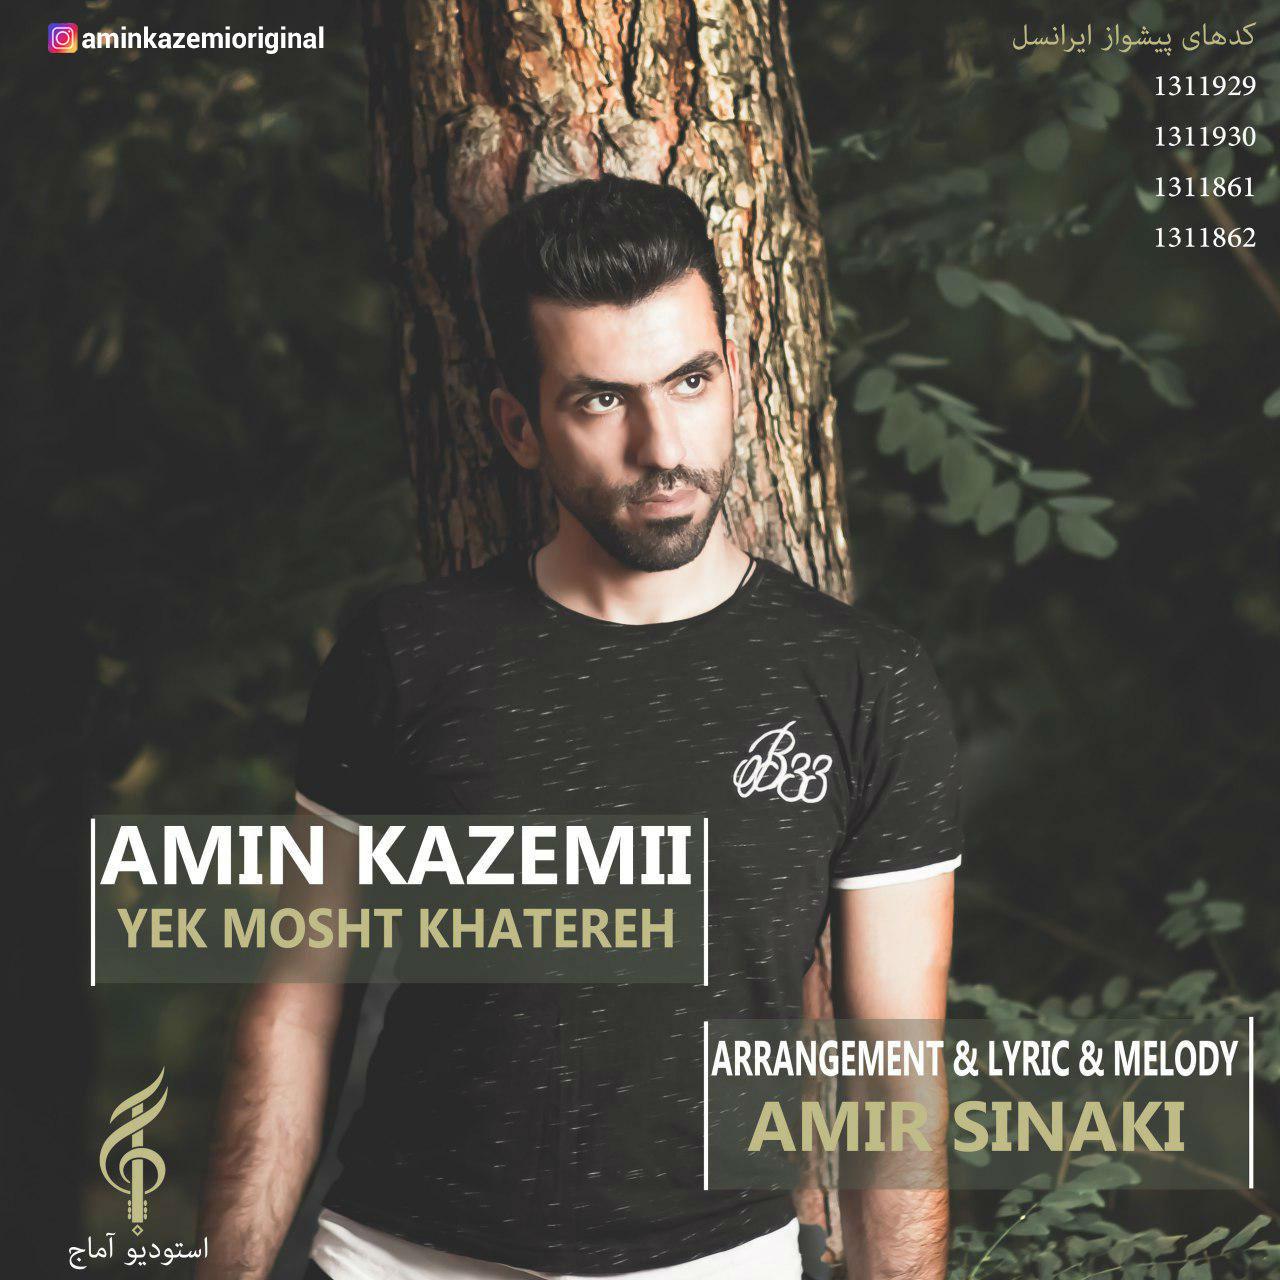 Amin Kazemii – Yek Mosht Khatereh